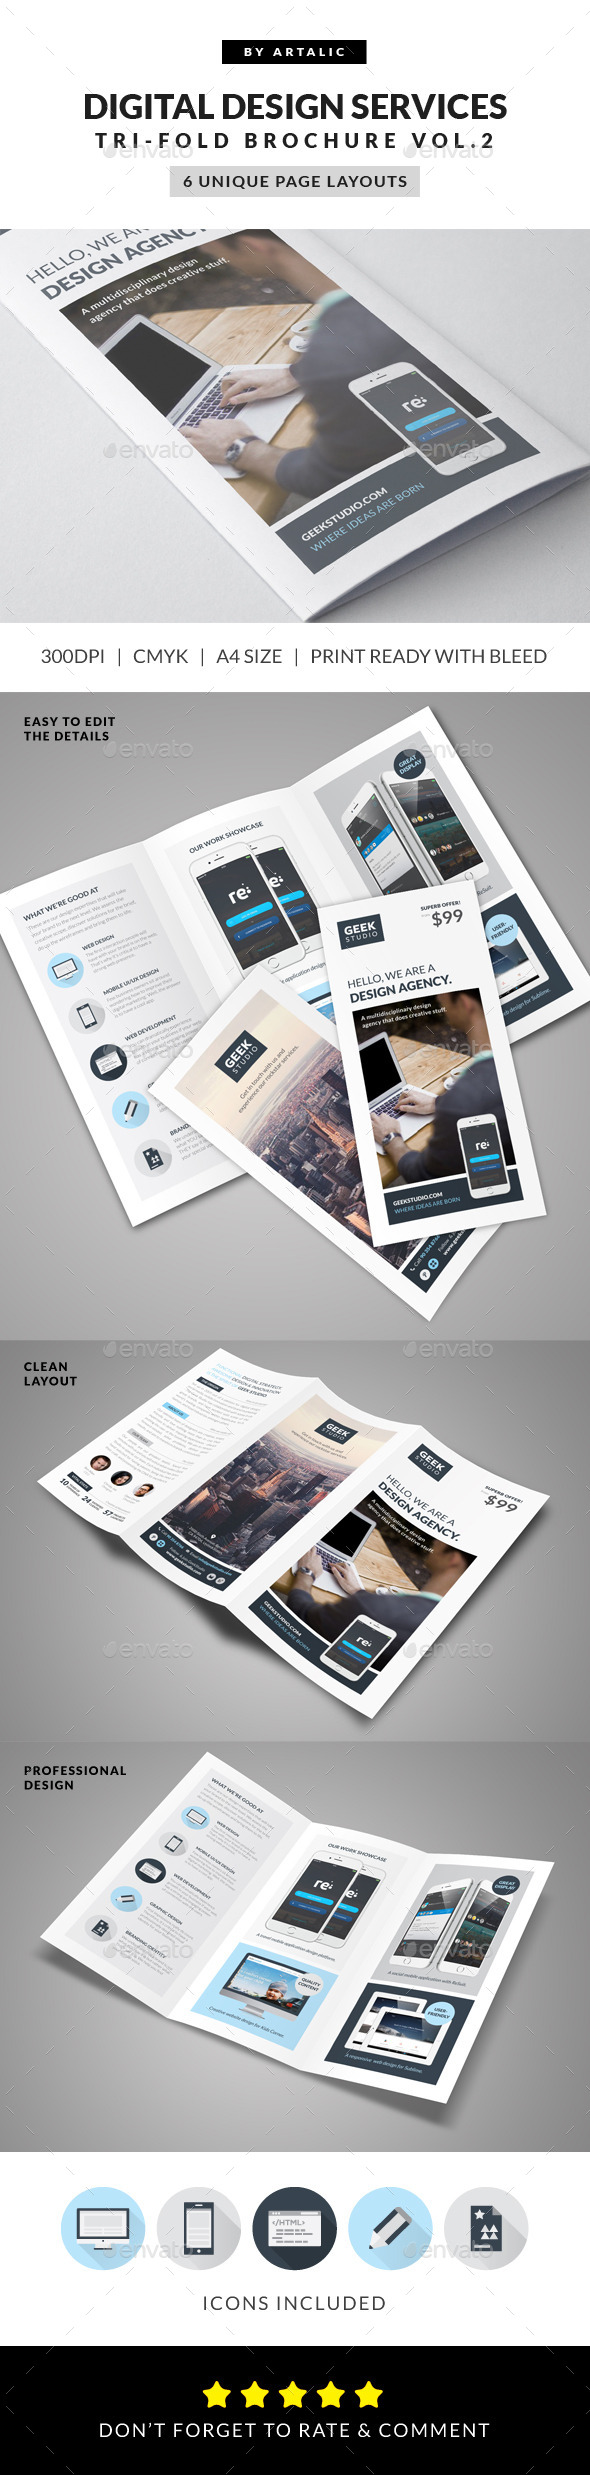 Digital Design Firm Brochure - Brochures Print Templates